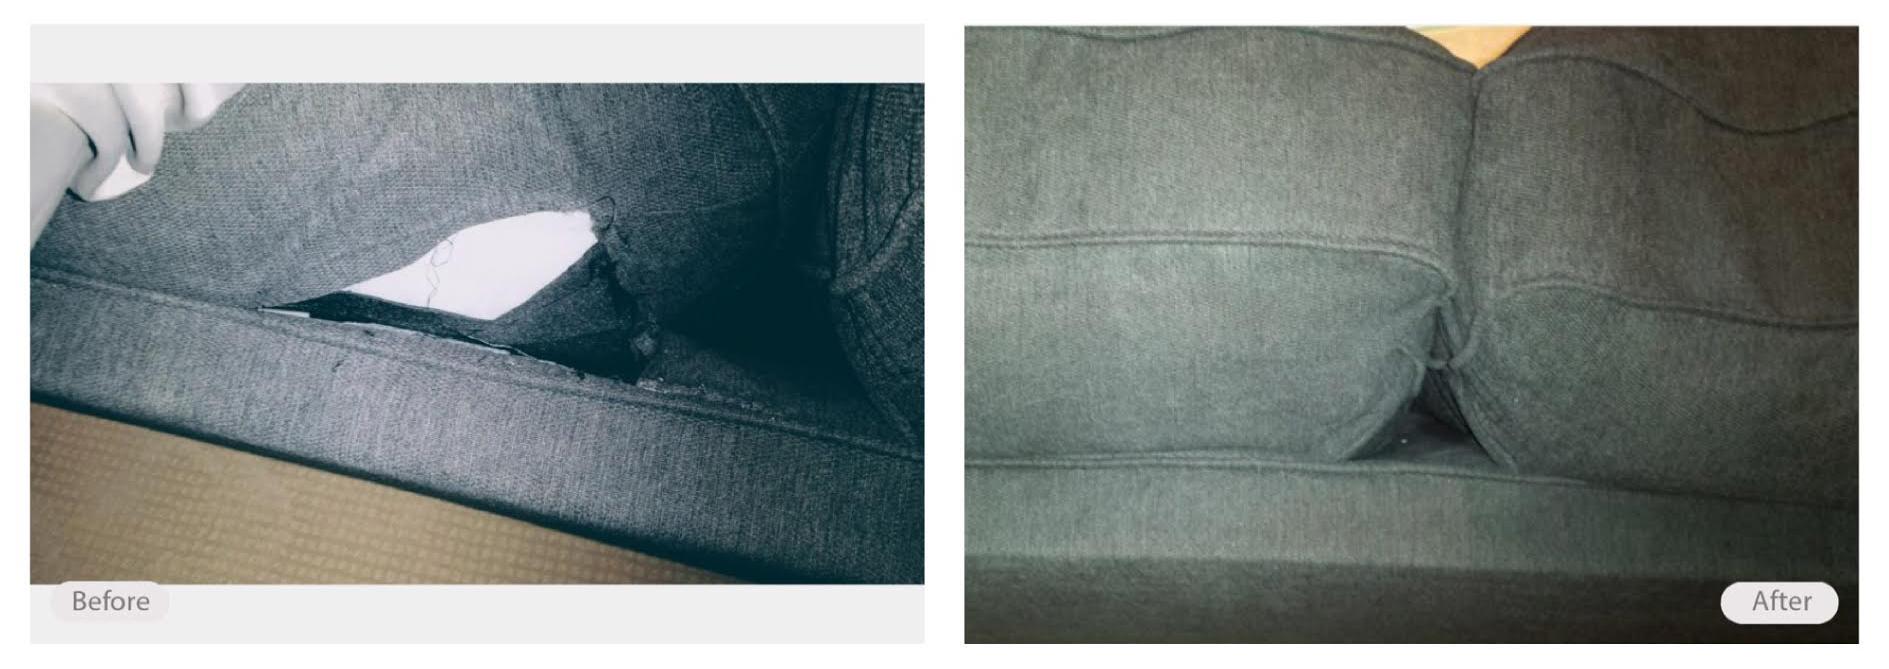 Ripped cushion seam repaired